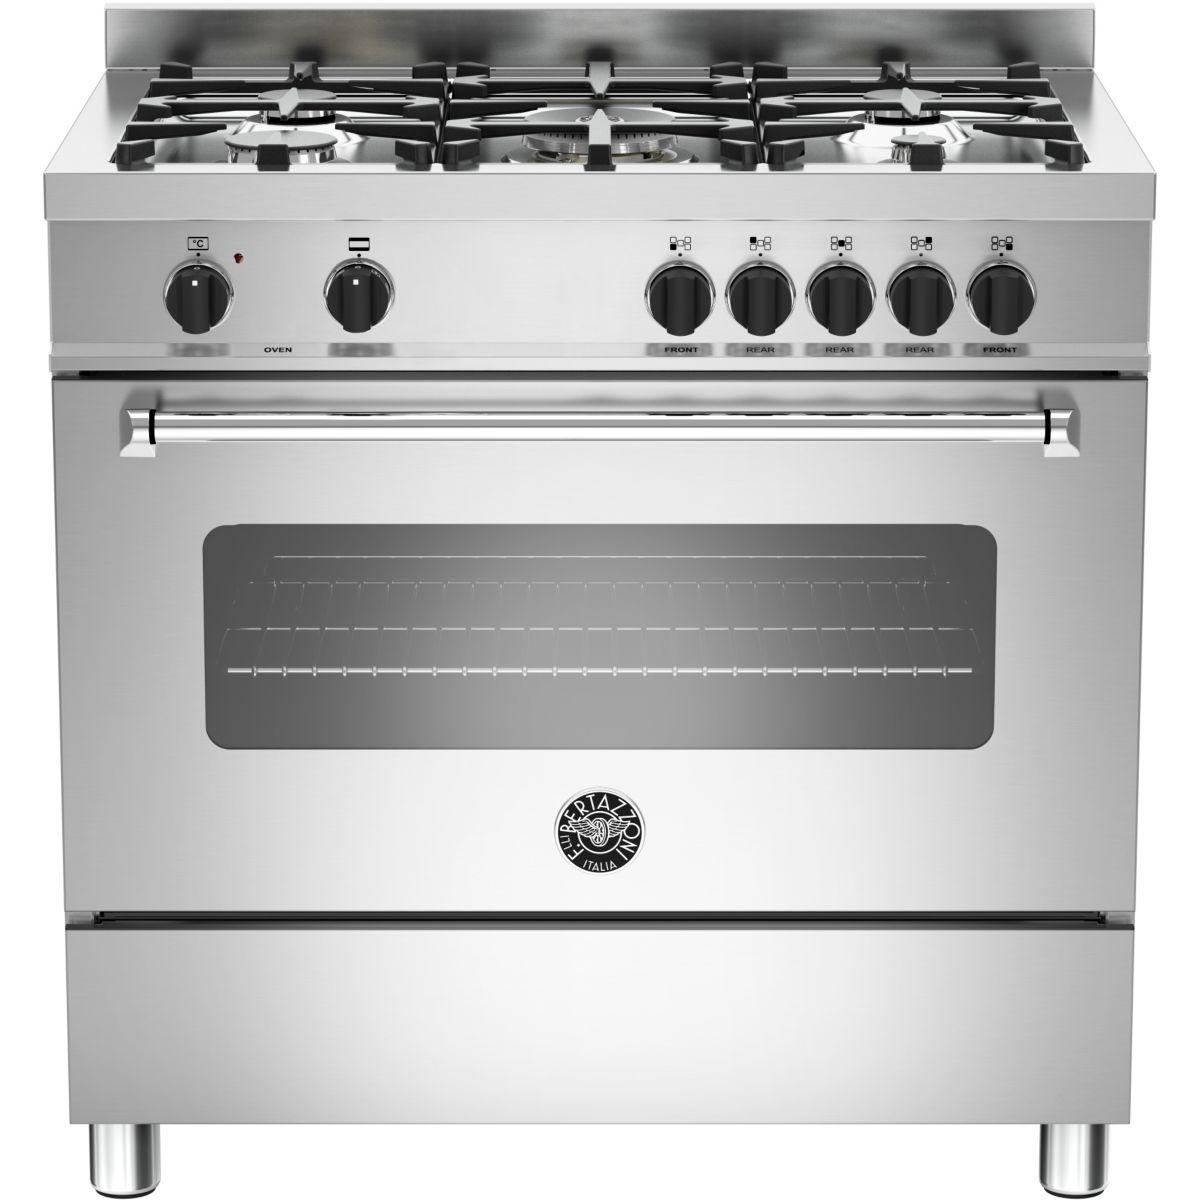 Cuisinière gaz BERTAZZONI MAS90 5 MFE S XE